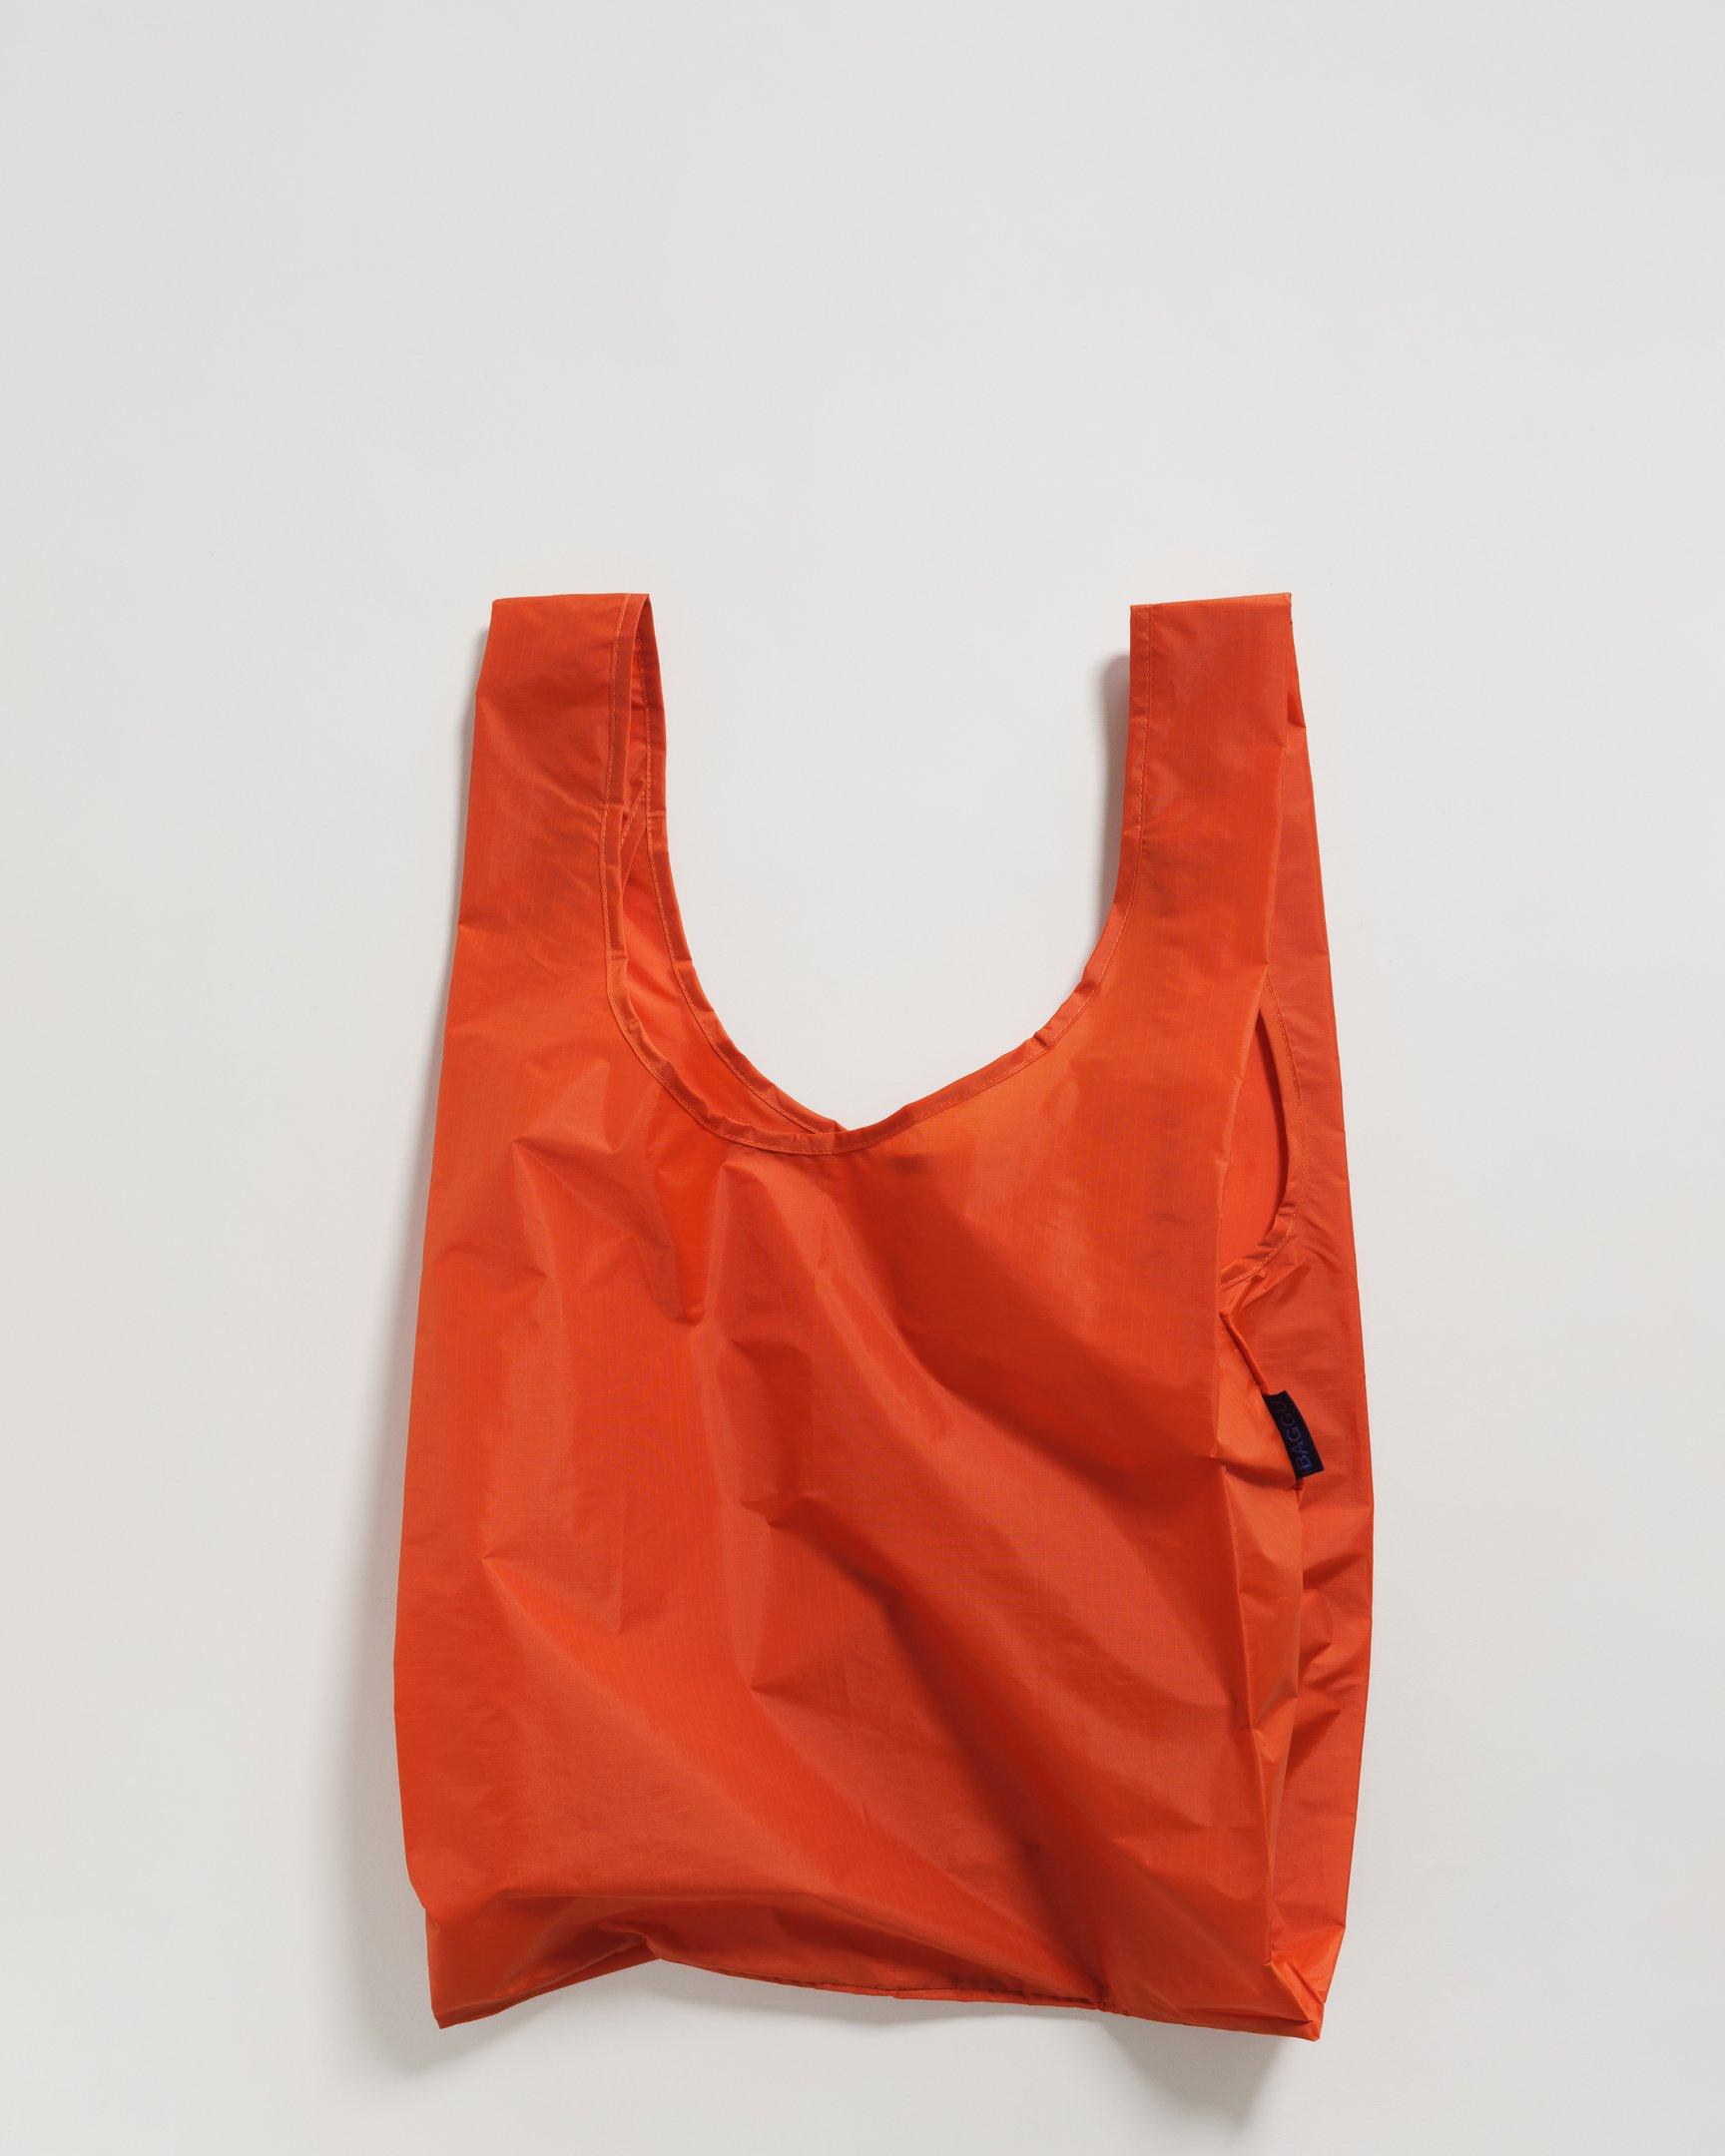 BAGGU Einkaufsbeutel Tomato